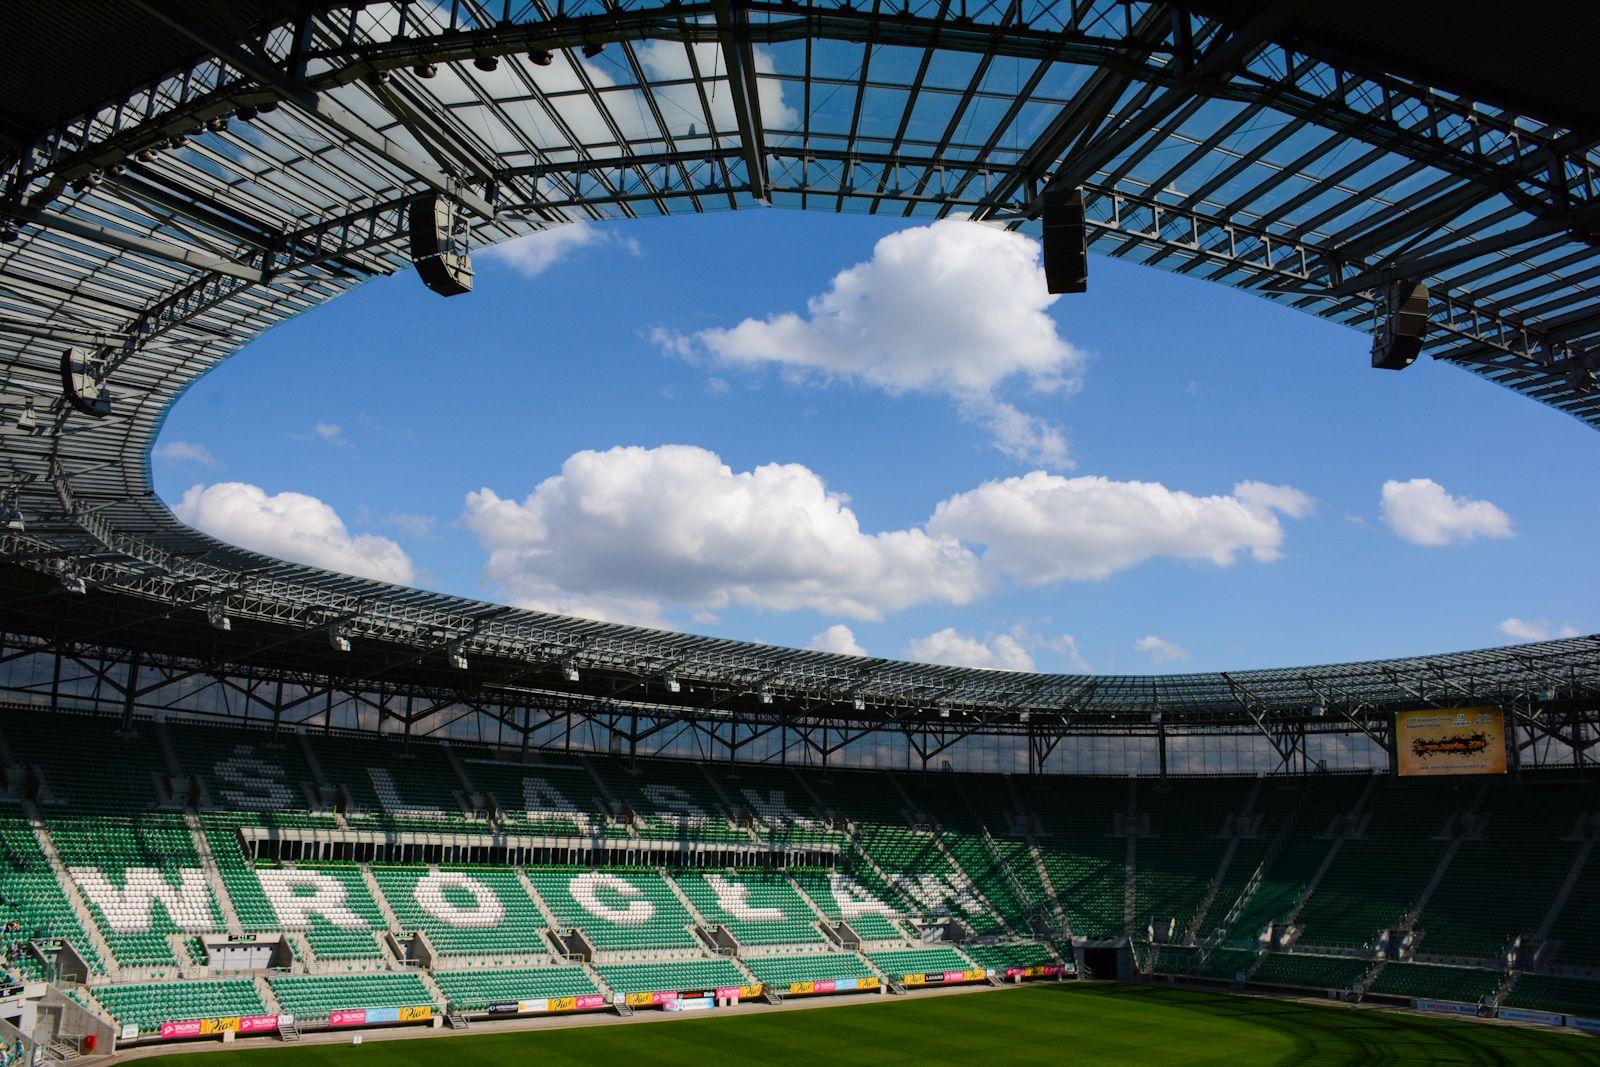 Stadion Miejski we Wrocławiu, Breslavia, Polonia. Capacidad 42.771 espectadores, Equipo local Śląsk Wrocław.